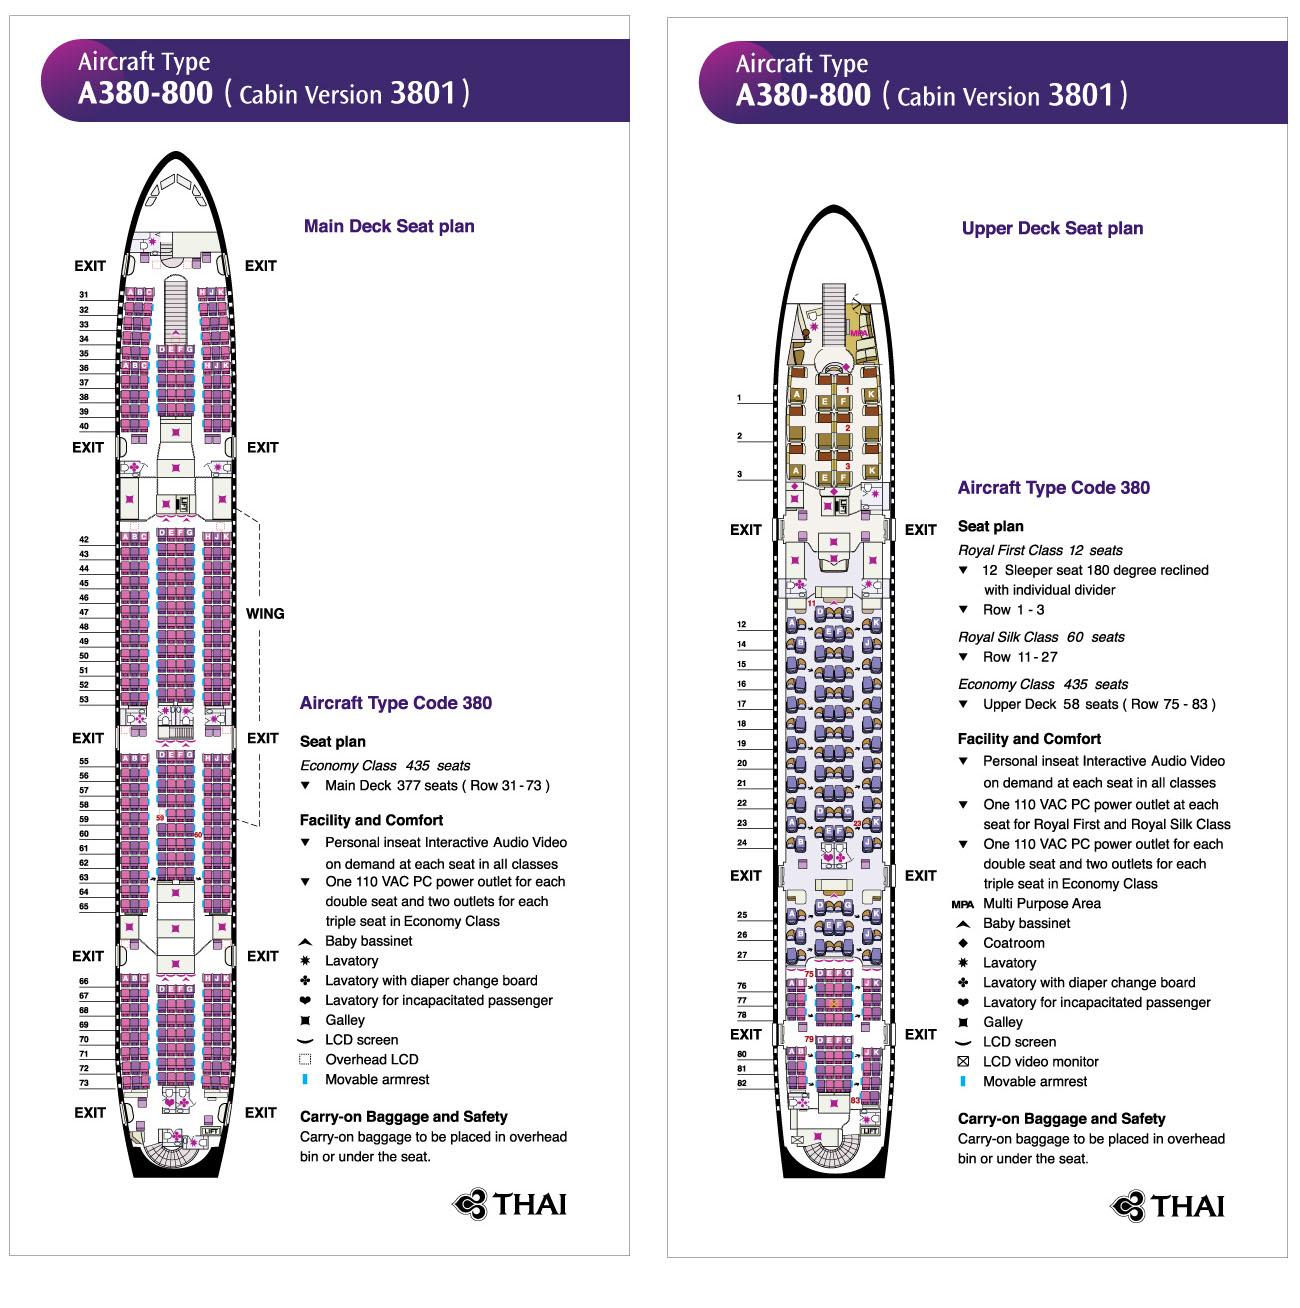 Thai Airways A380-800 Cabin Seating Plan